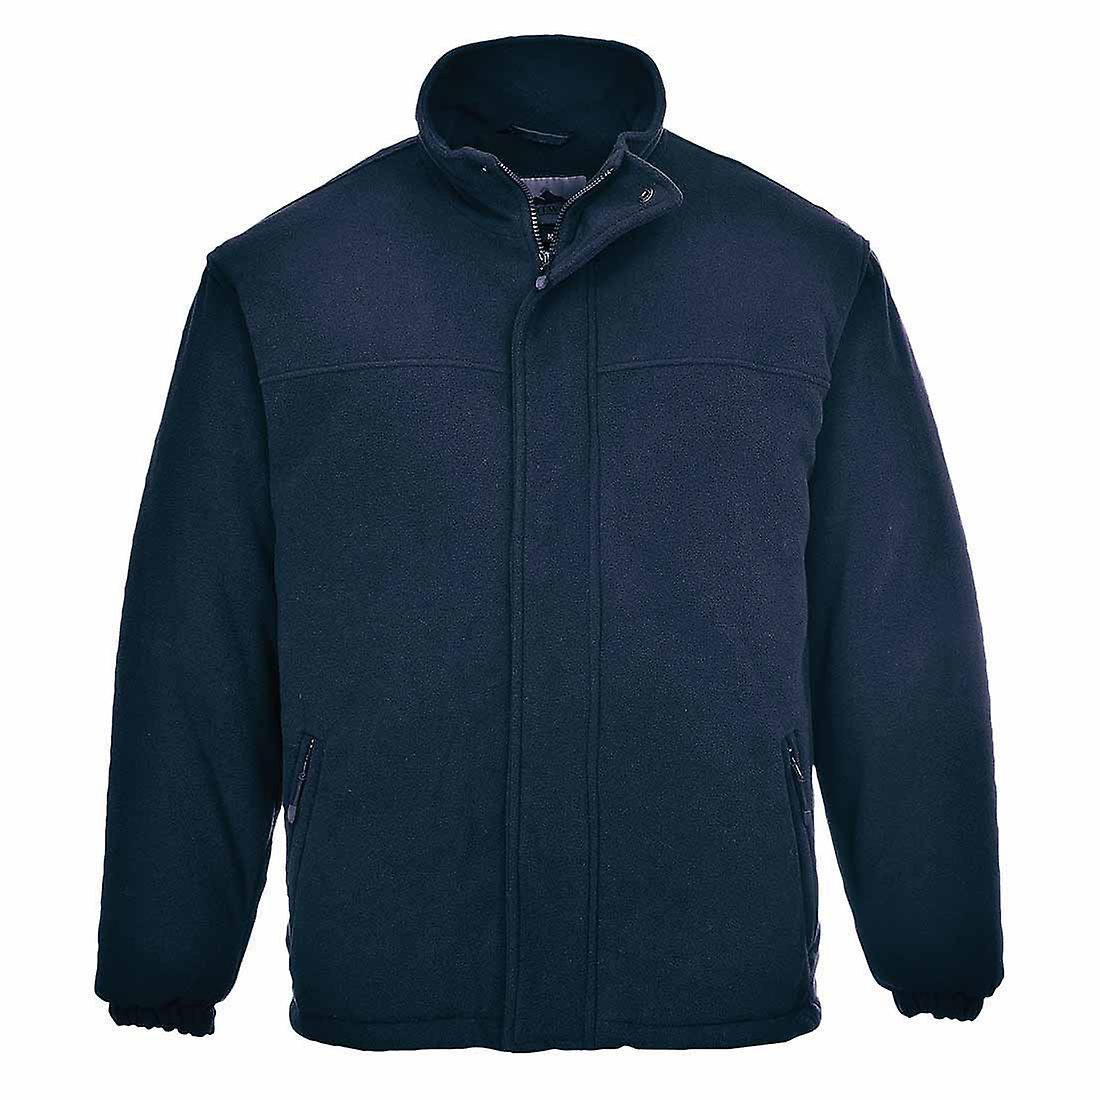 Portwest - Yukon Quilted Workwear Warm Ant Pill Fleece Jacket